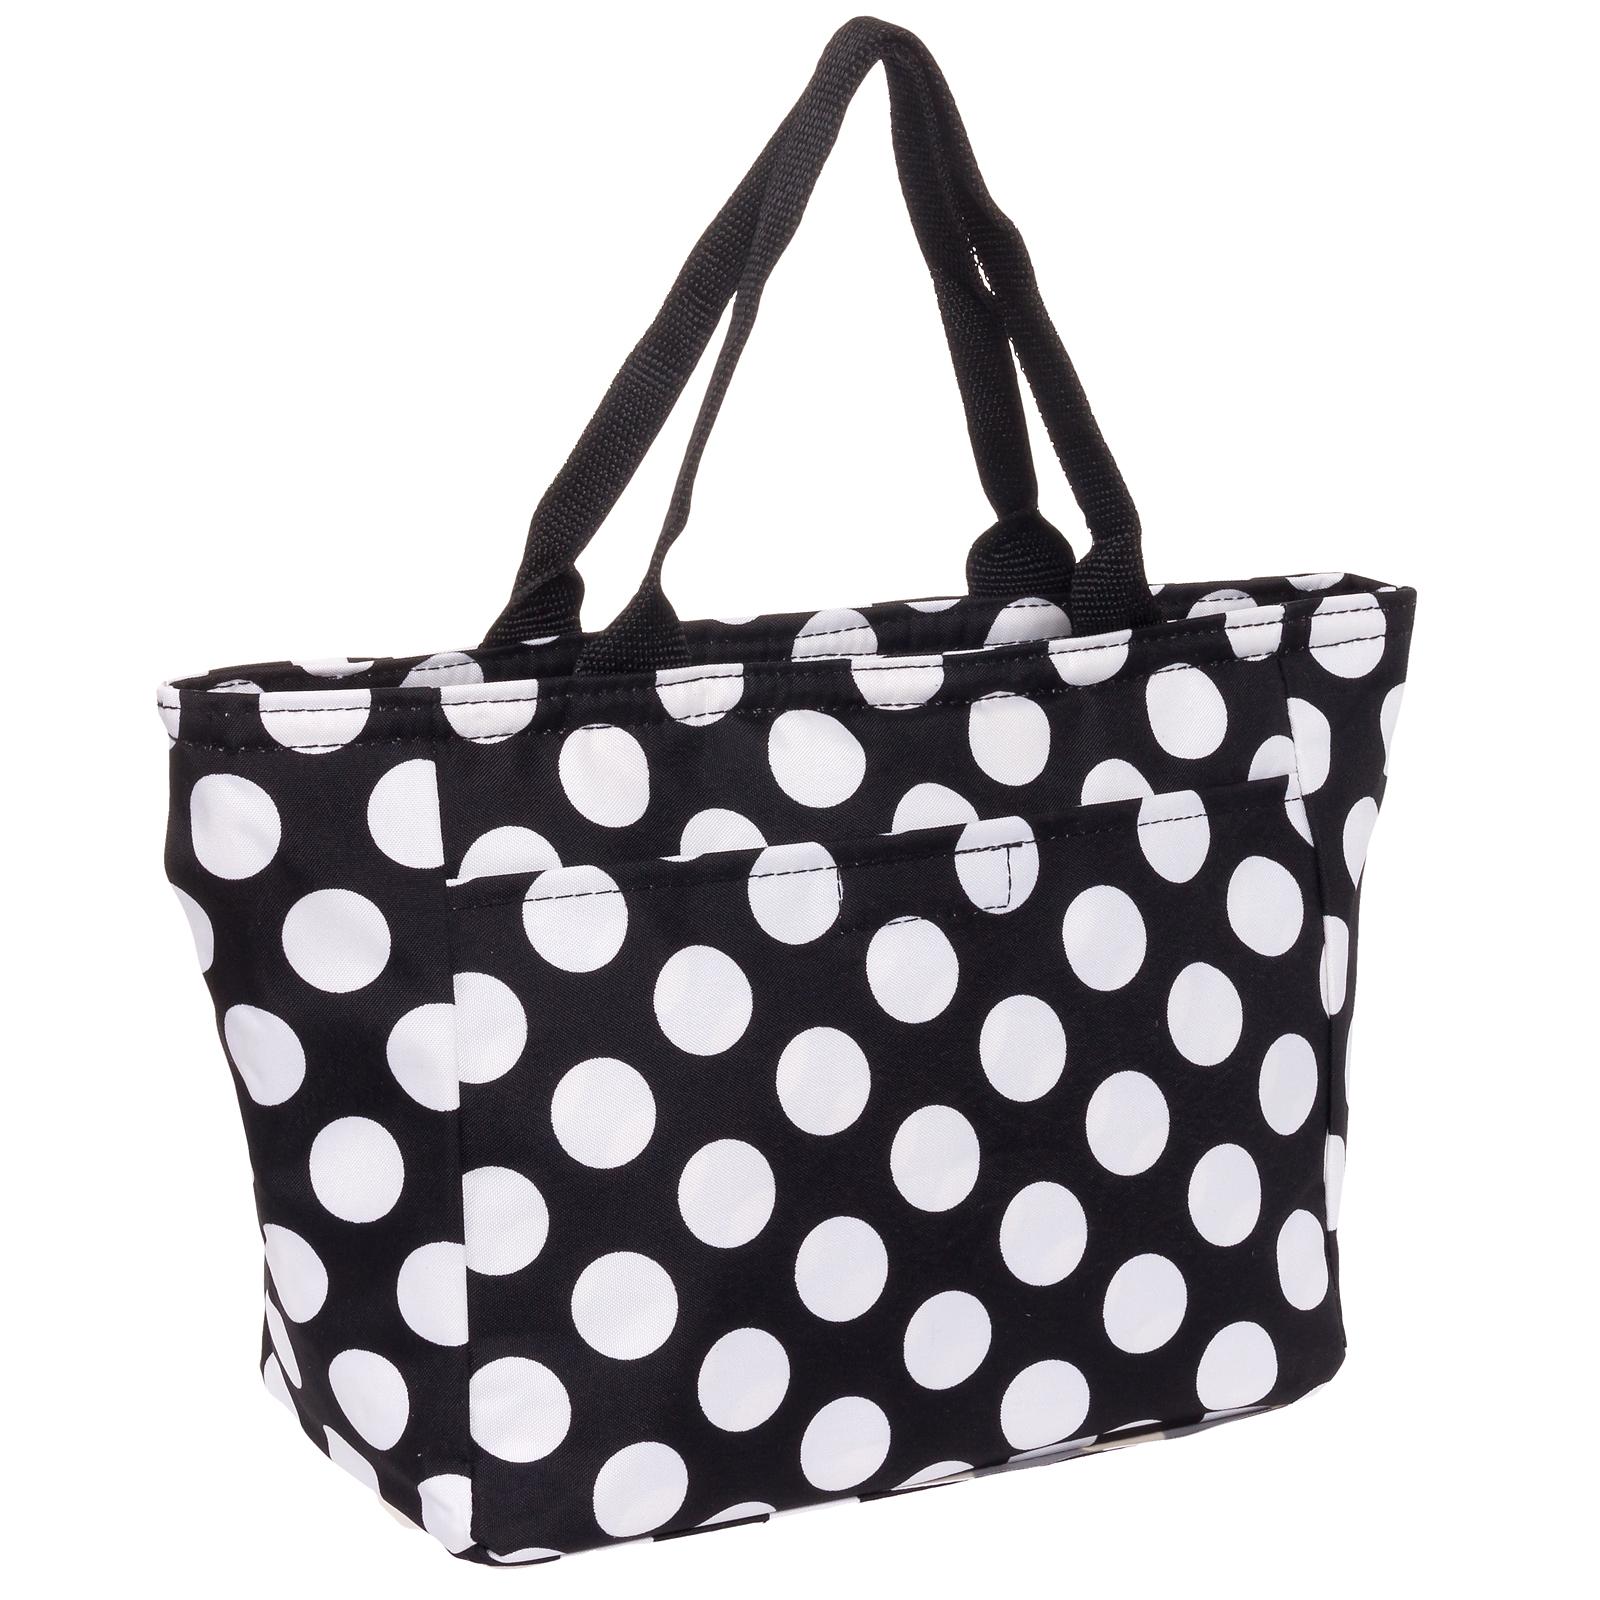 Beautiful Lunch Bag Insulated Women Lunch BagFabric Lunch Bag Gray